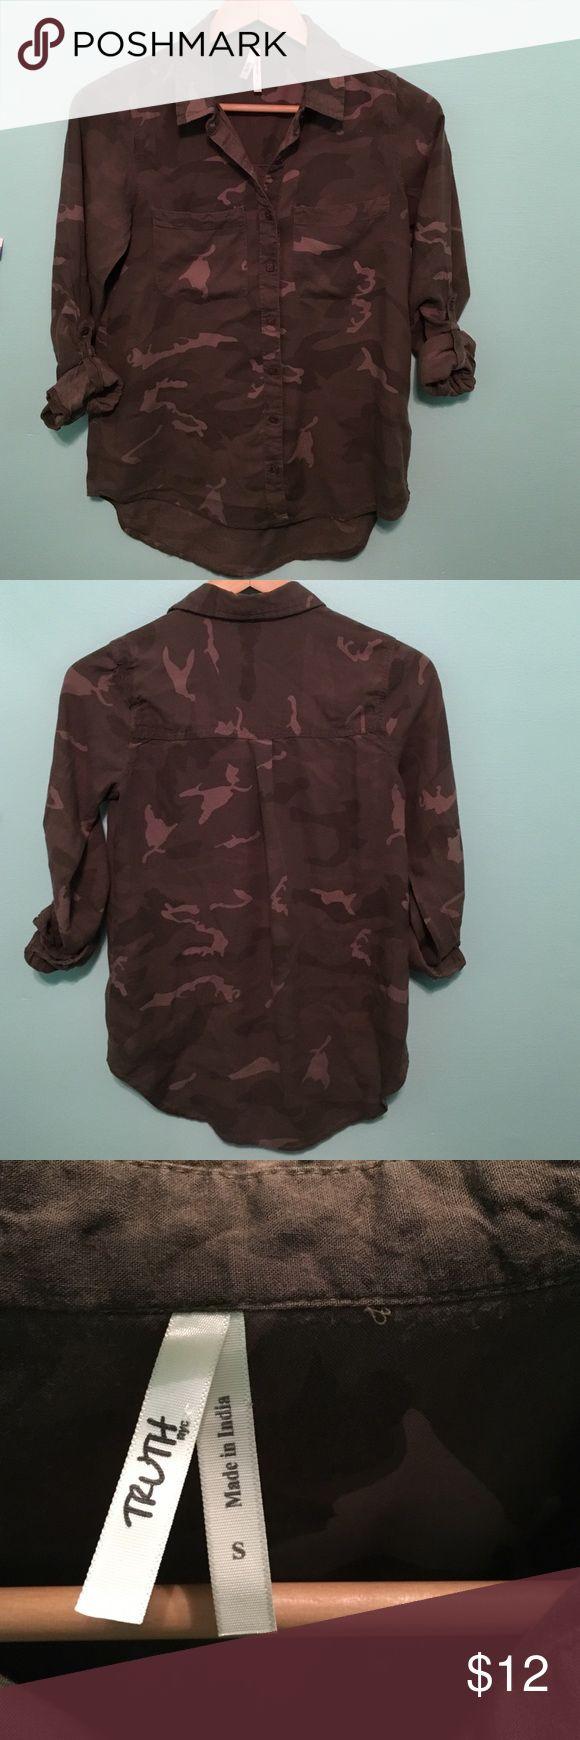 Women's Long Sleeve Camouflage shirt Used: Camo print long sleeve shirt Truth nyc Tops Button Down Shirts